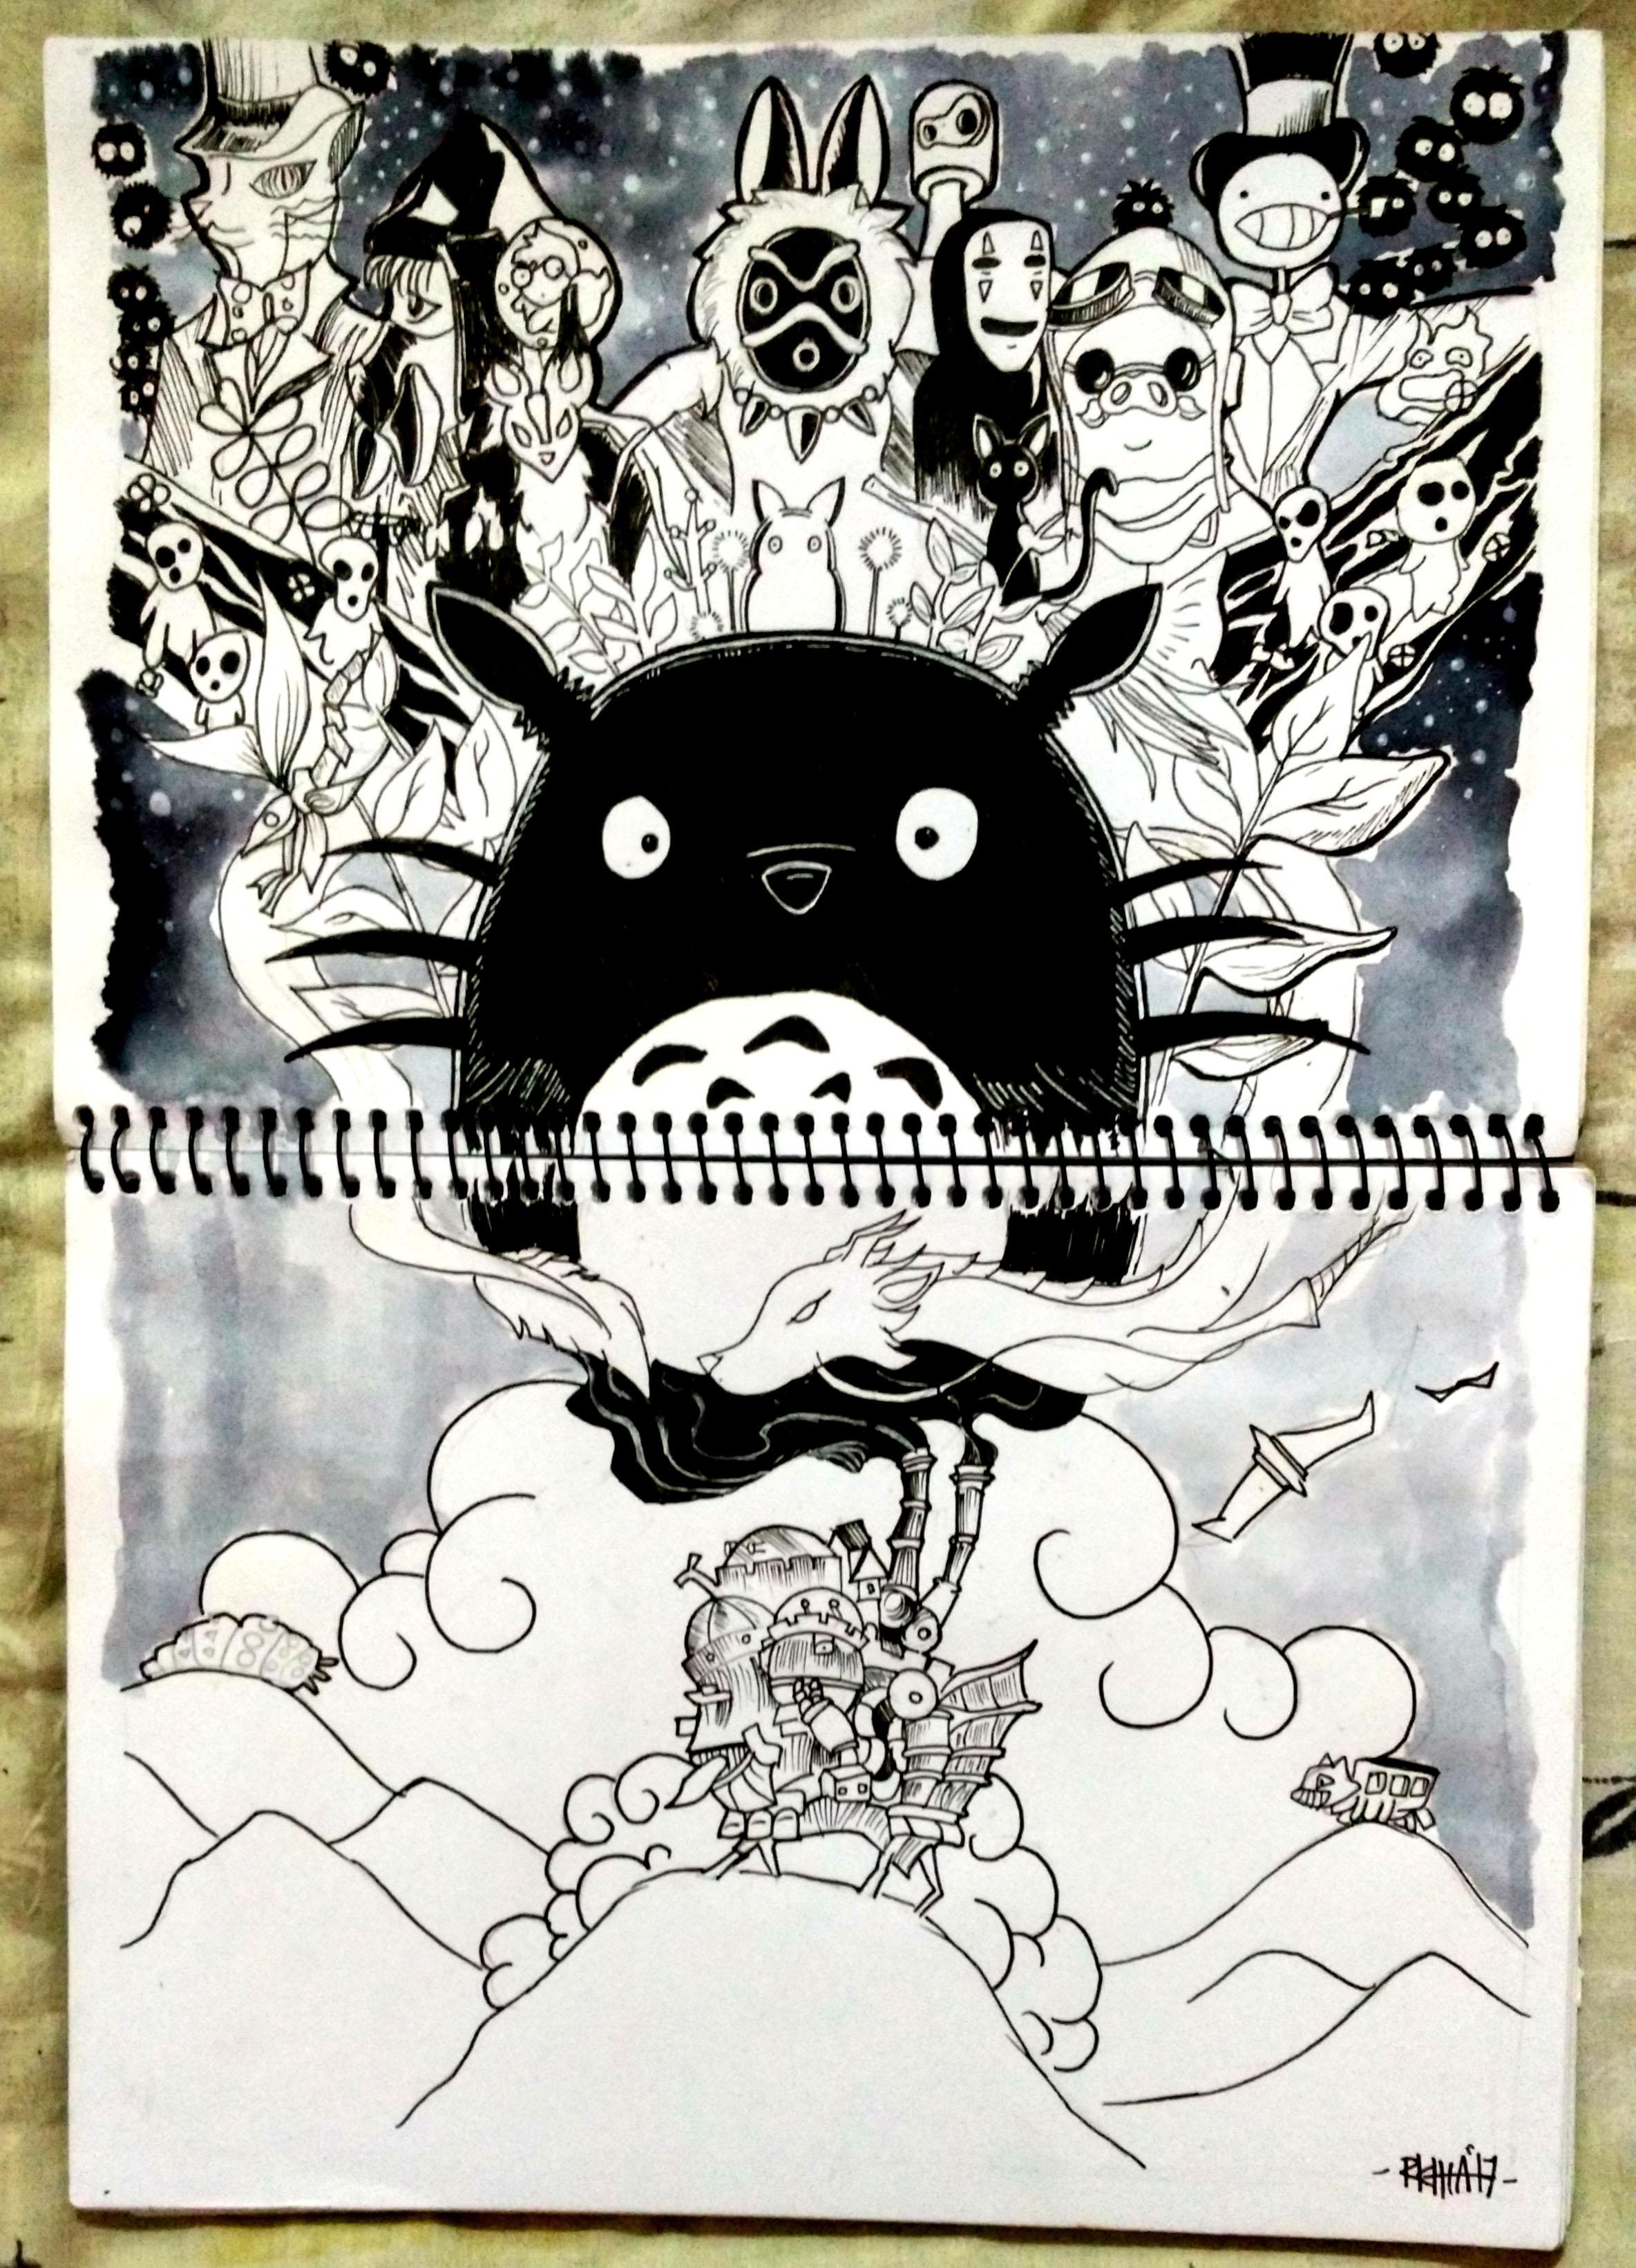 Ghibli.jpg